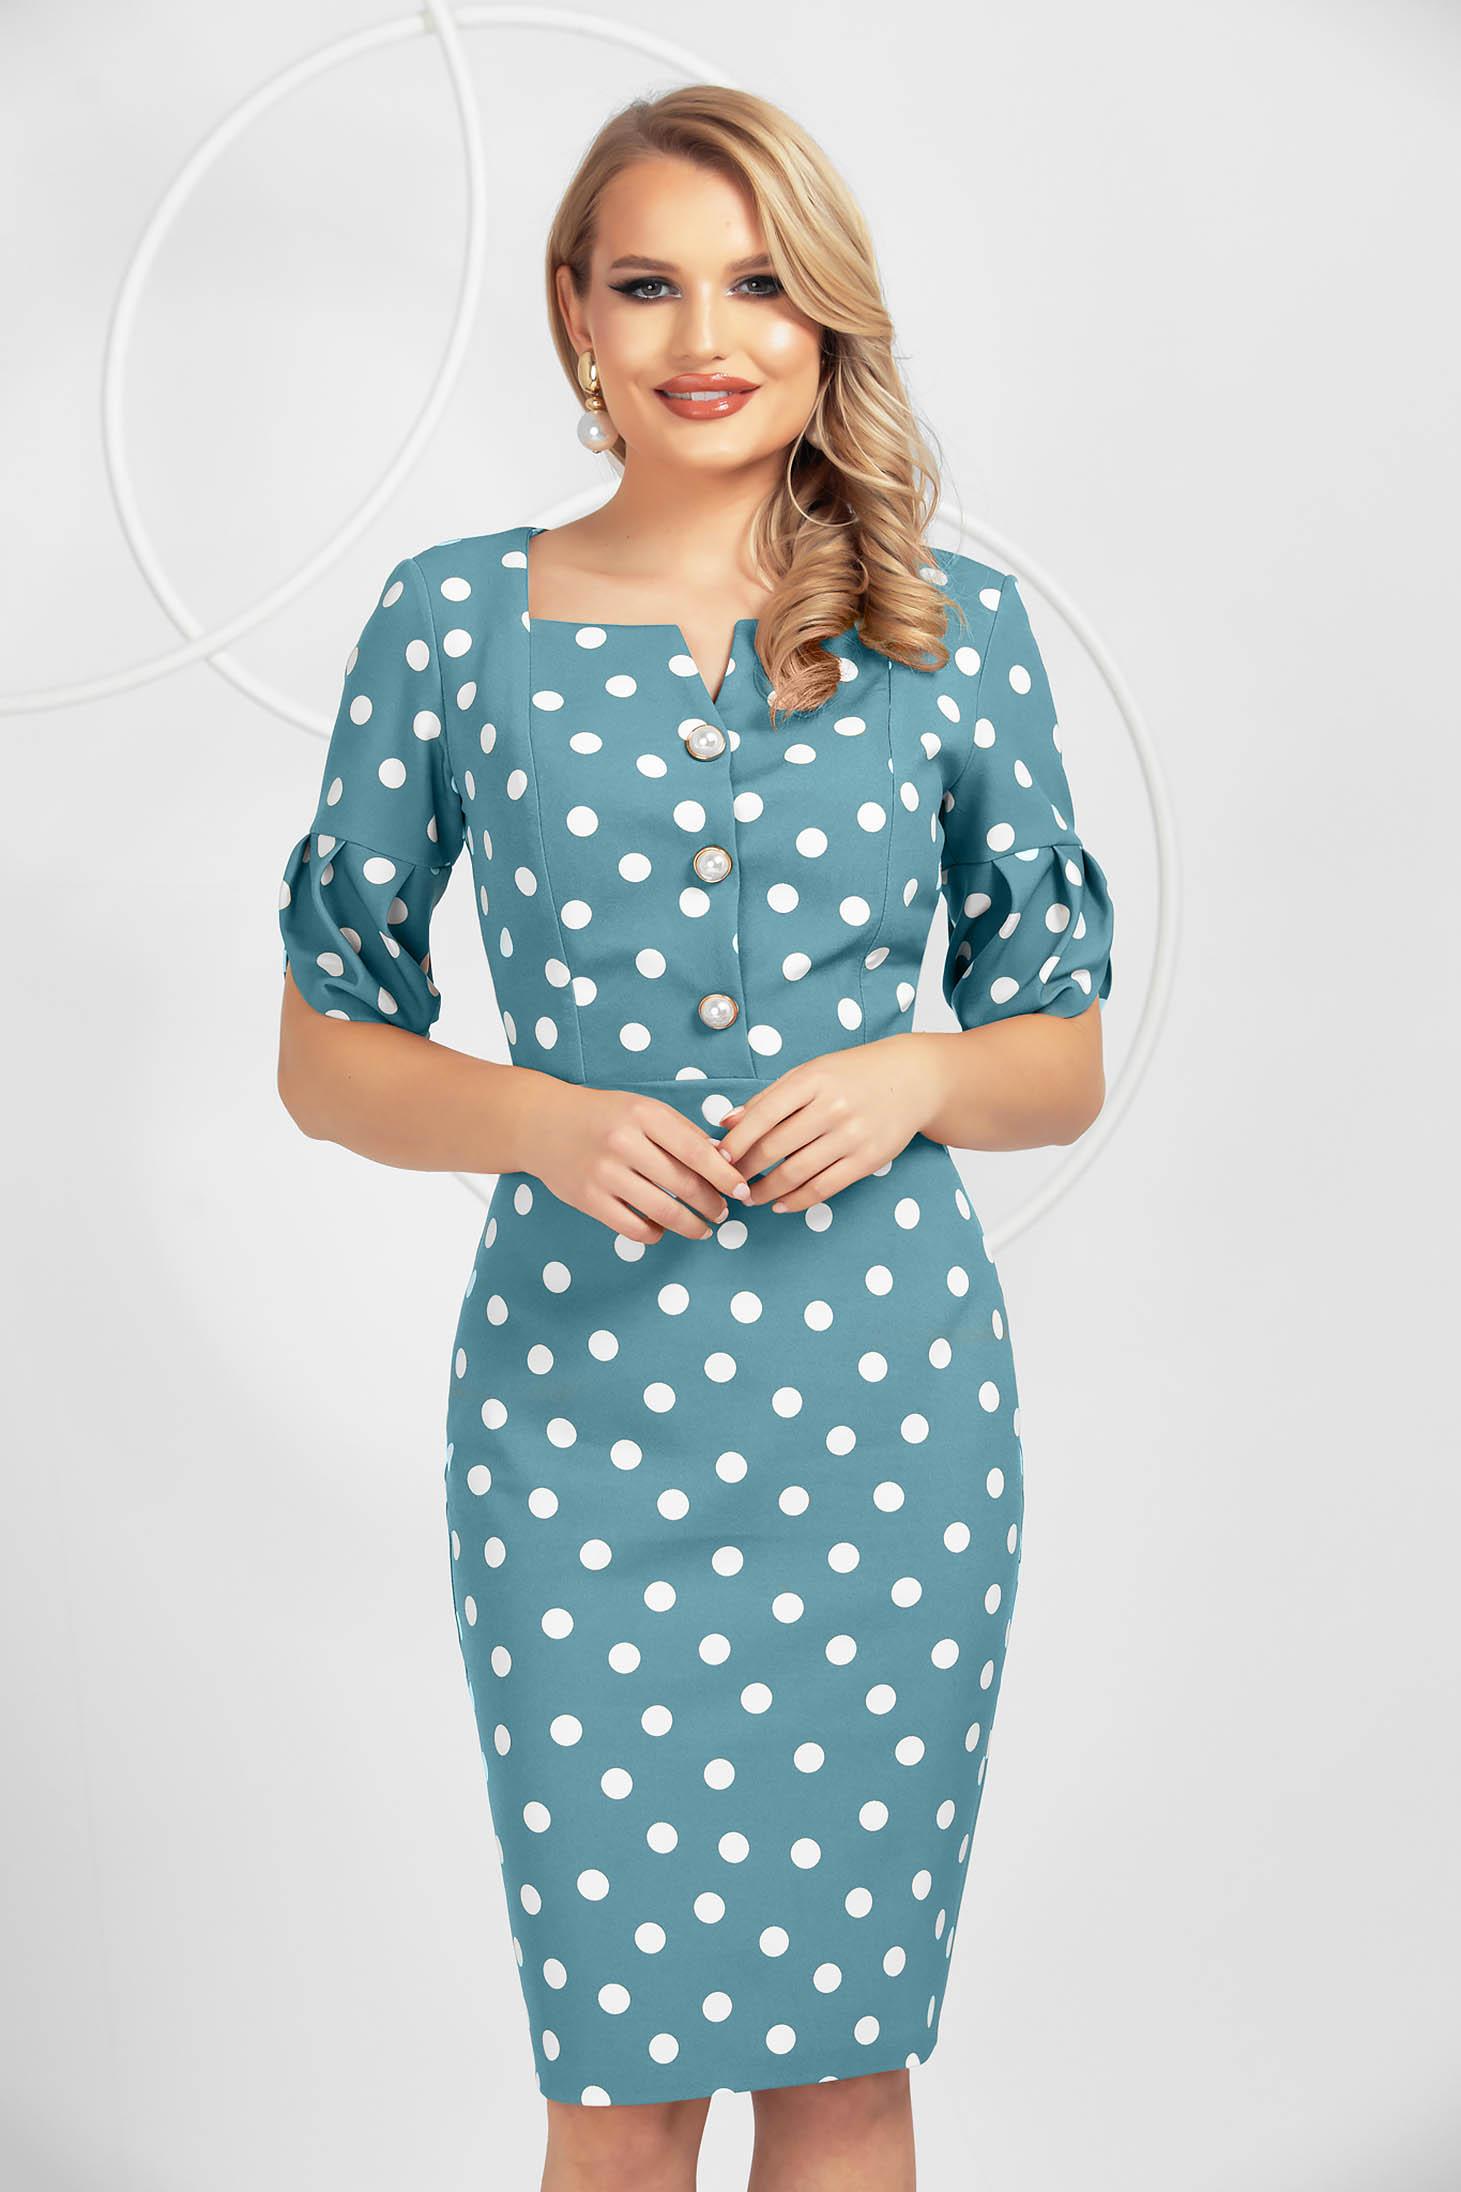 Turquoise slightly elastic fabric dots print dress midi pencil